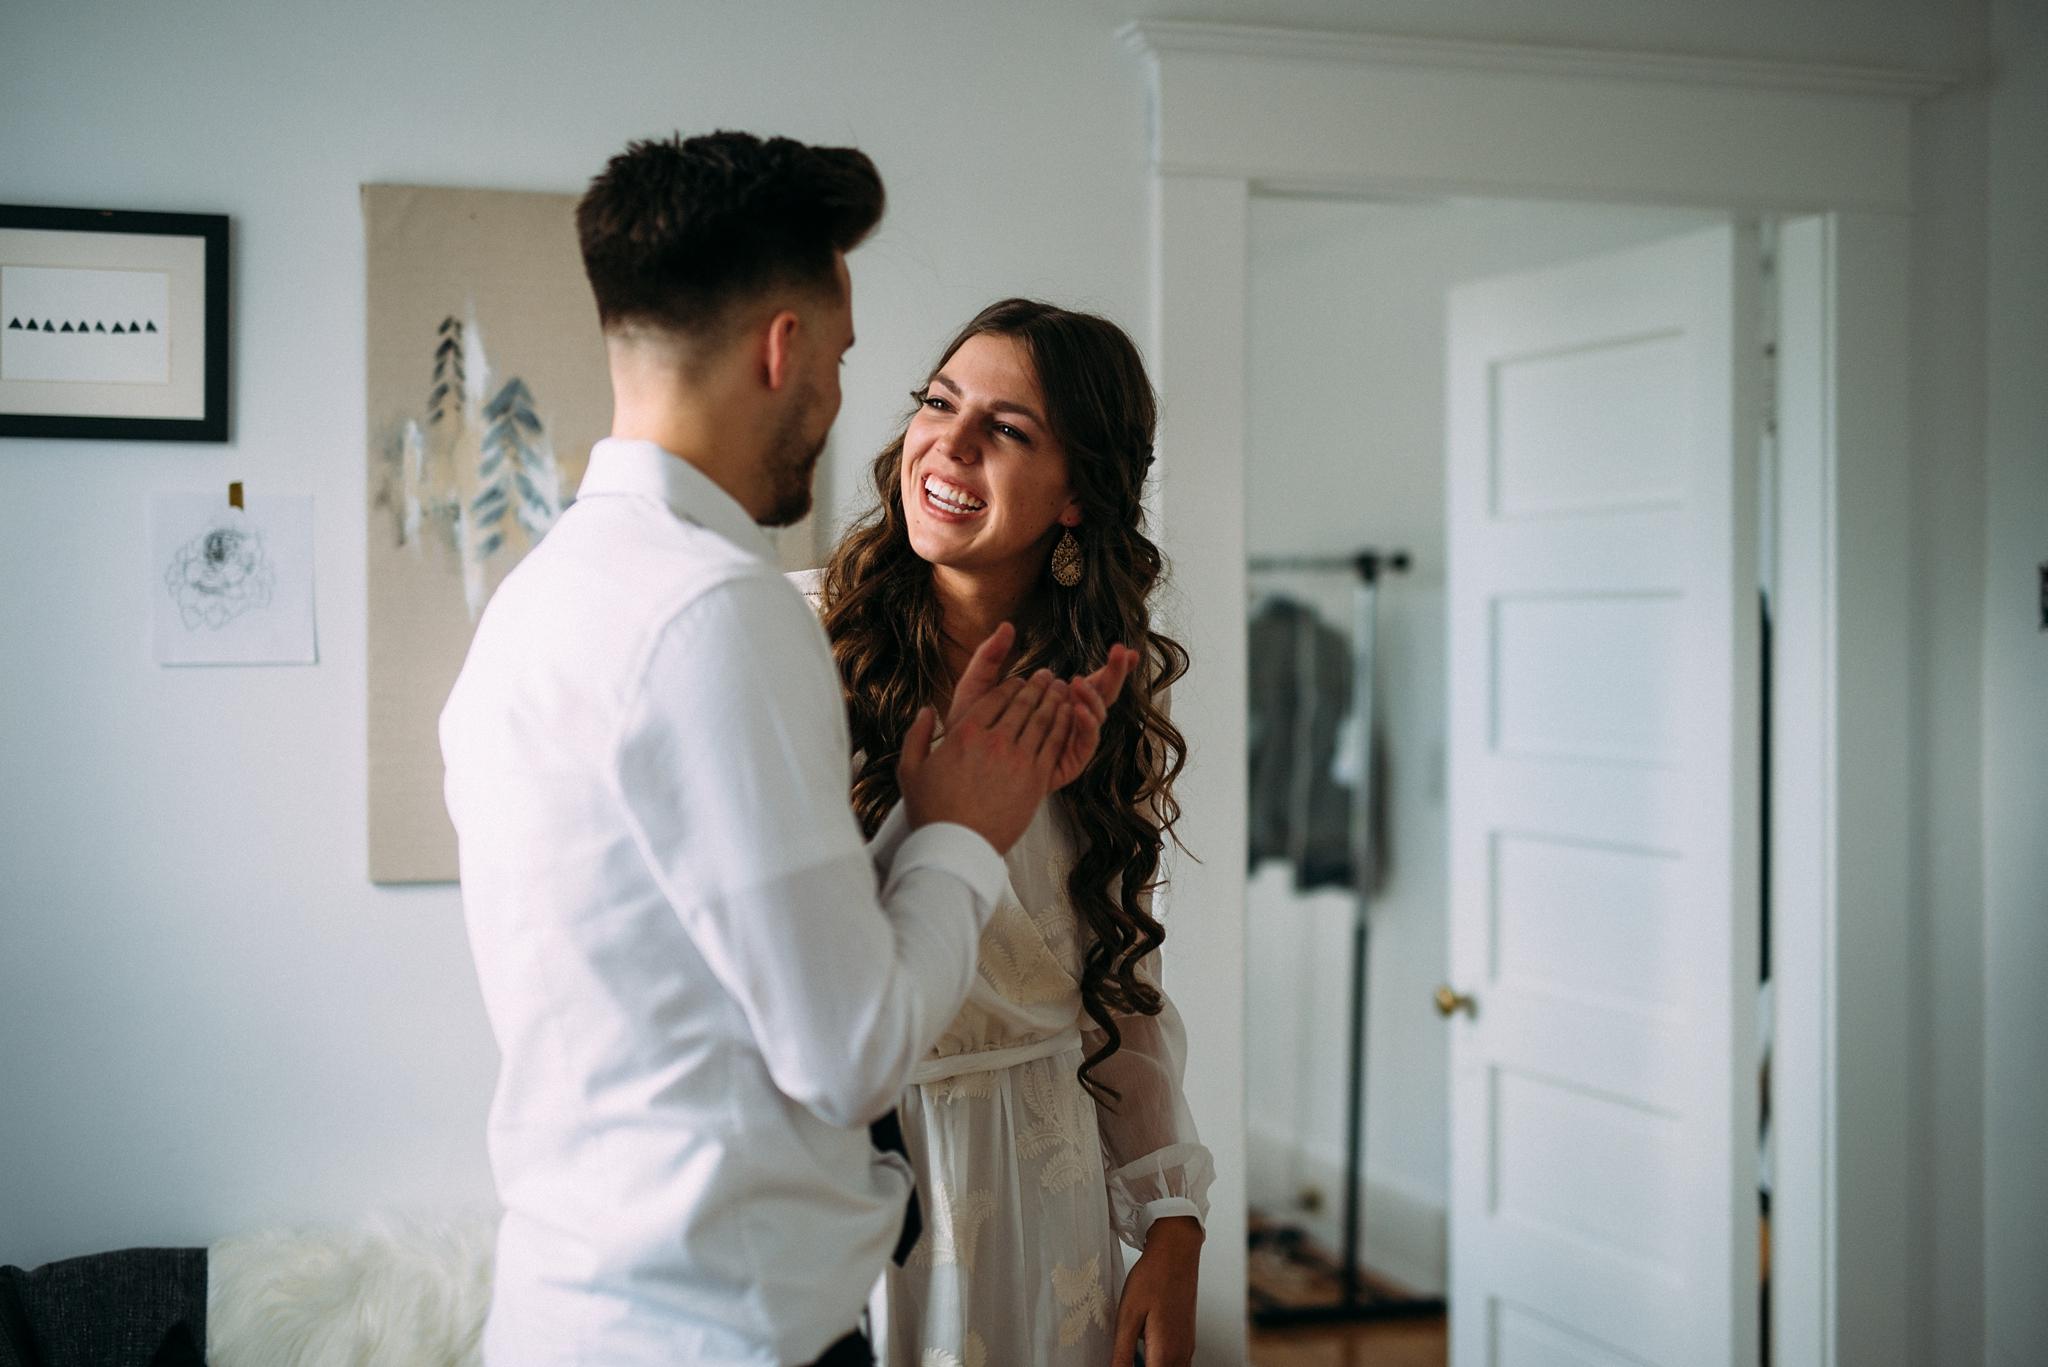 kaihla_tonai_intimate_wedding_elopement_photographer_3996